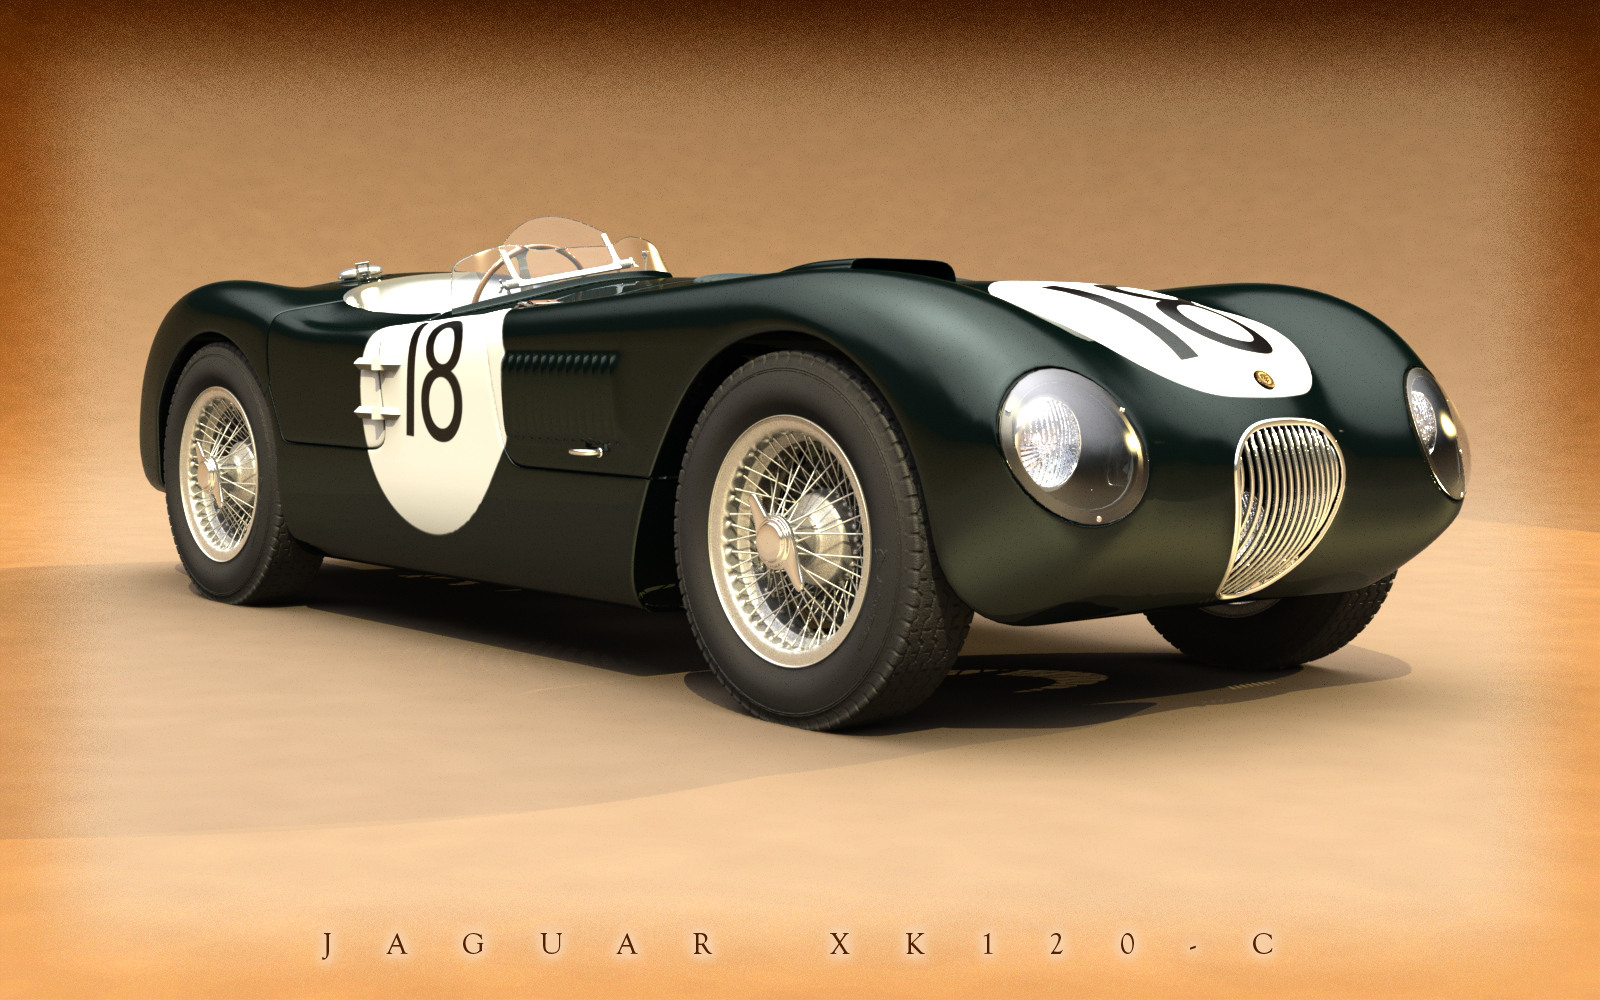 JaguarXK120-C_LeMans.jpg